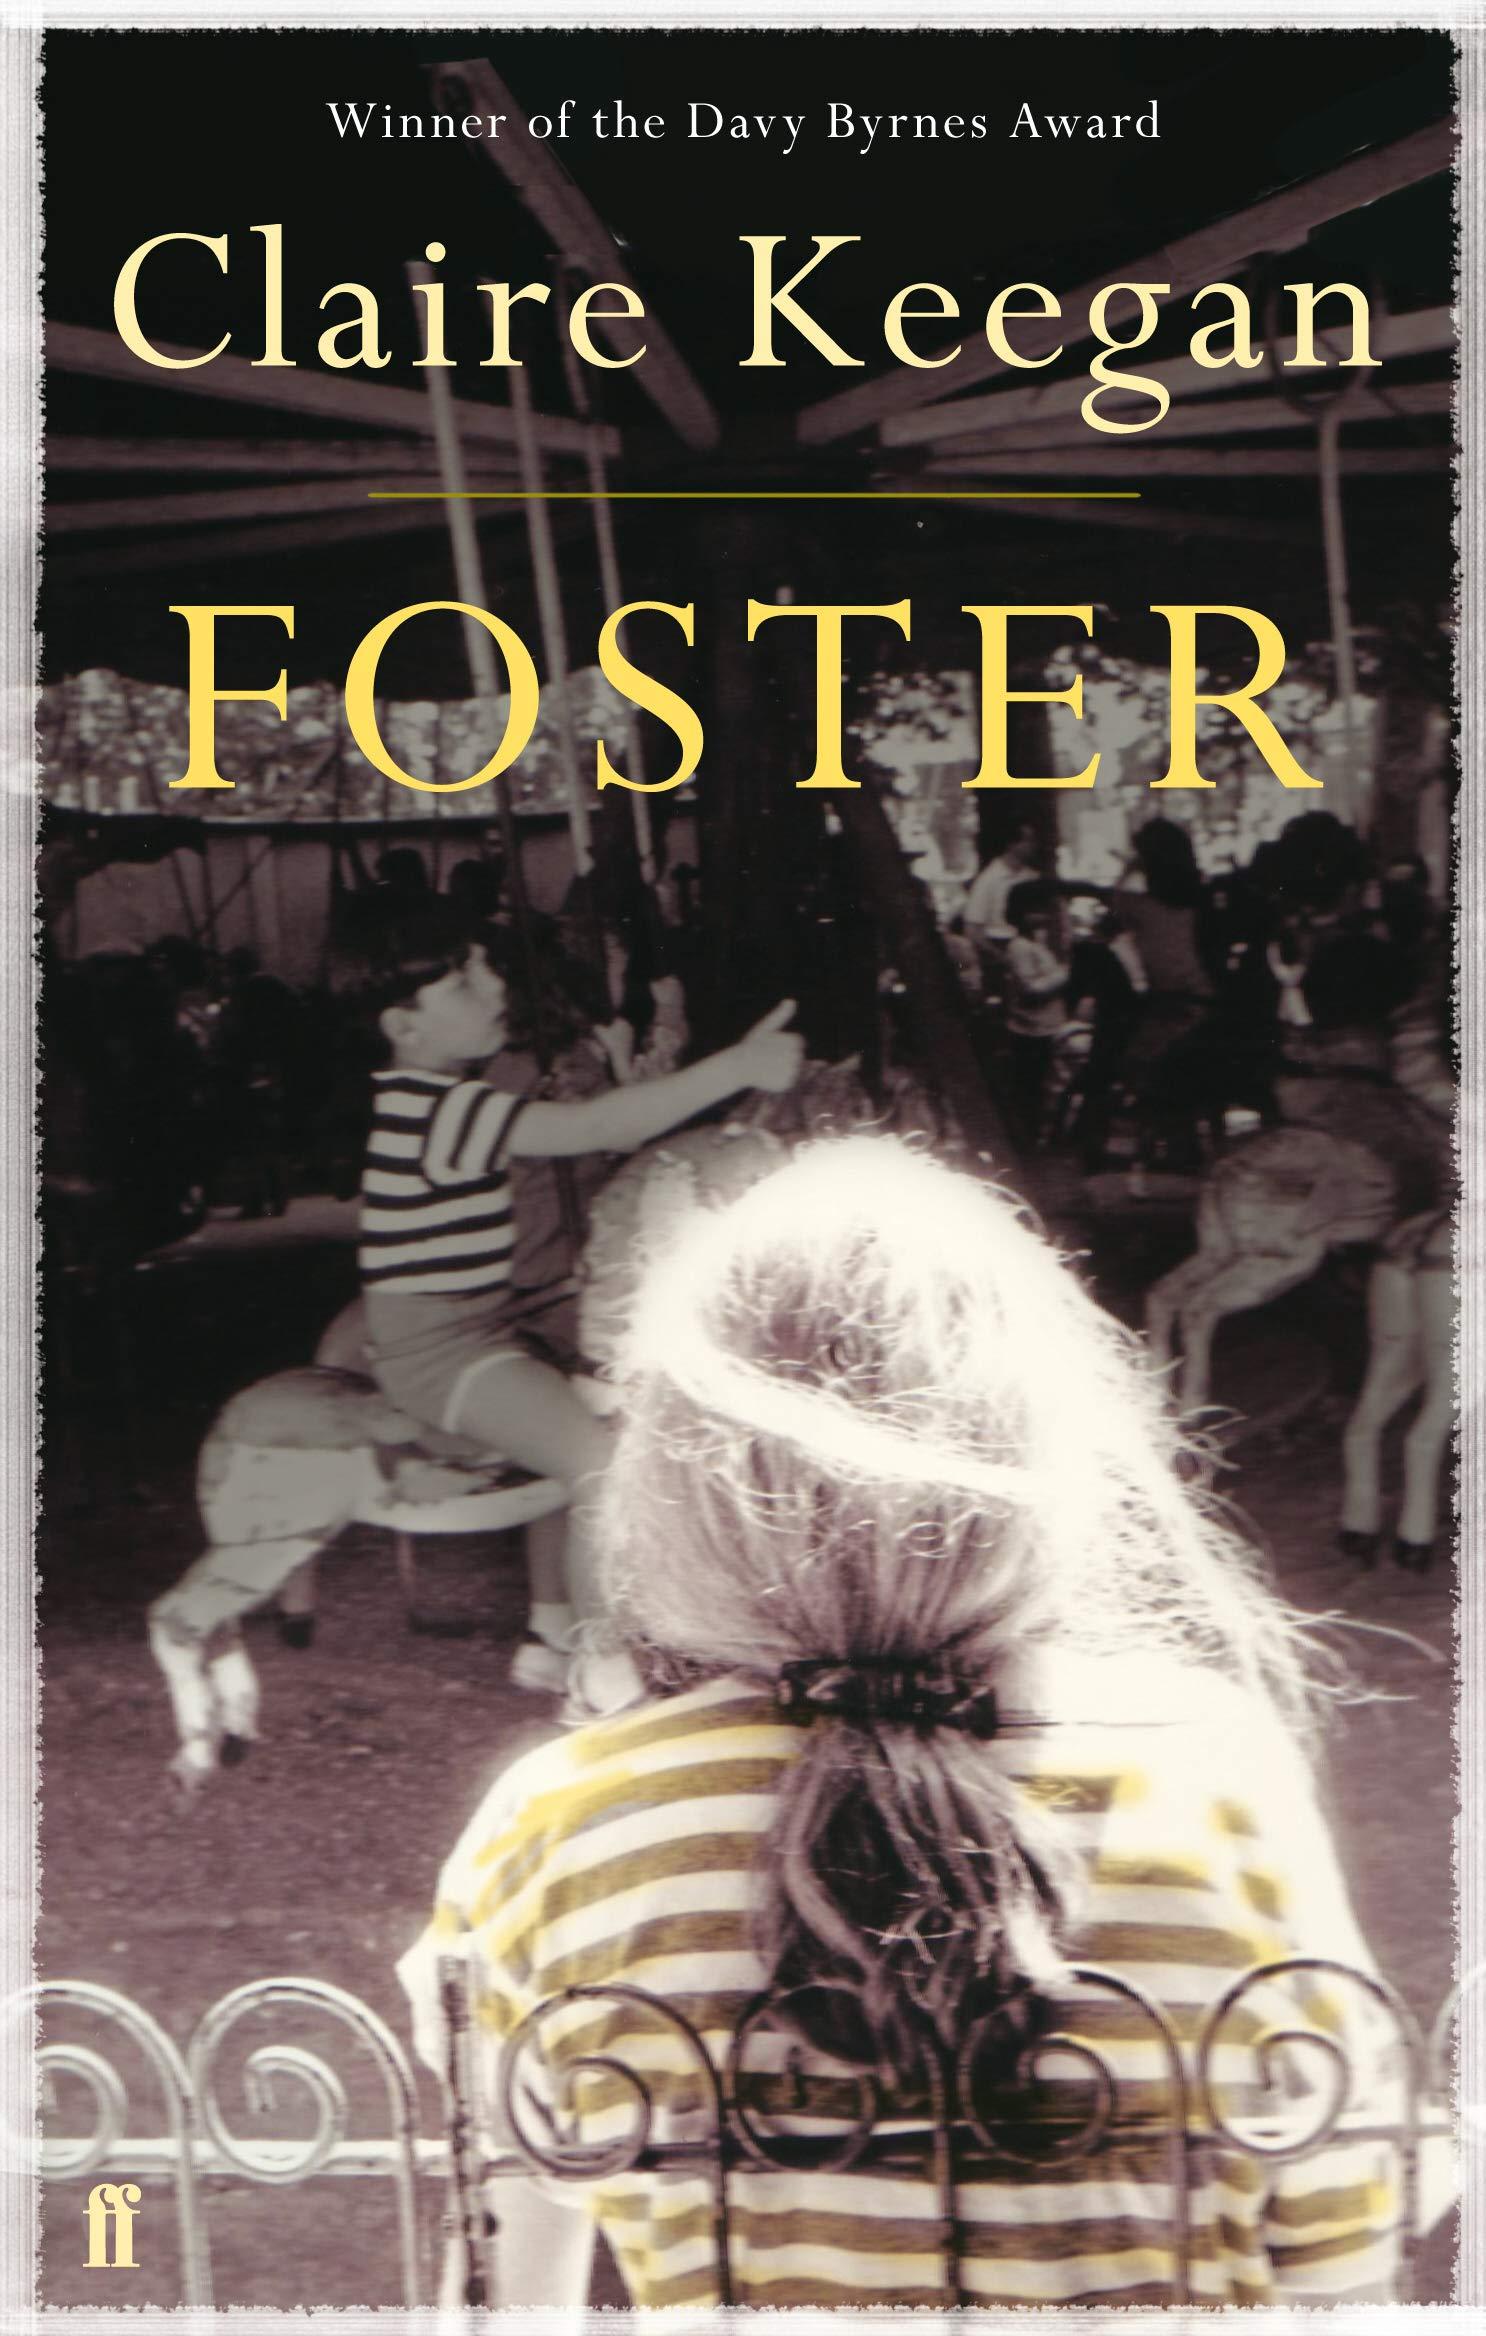 foster claire keegan  : Foster (9780571255658): Claire Keegan: Books